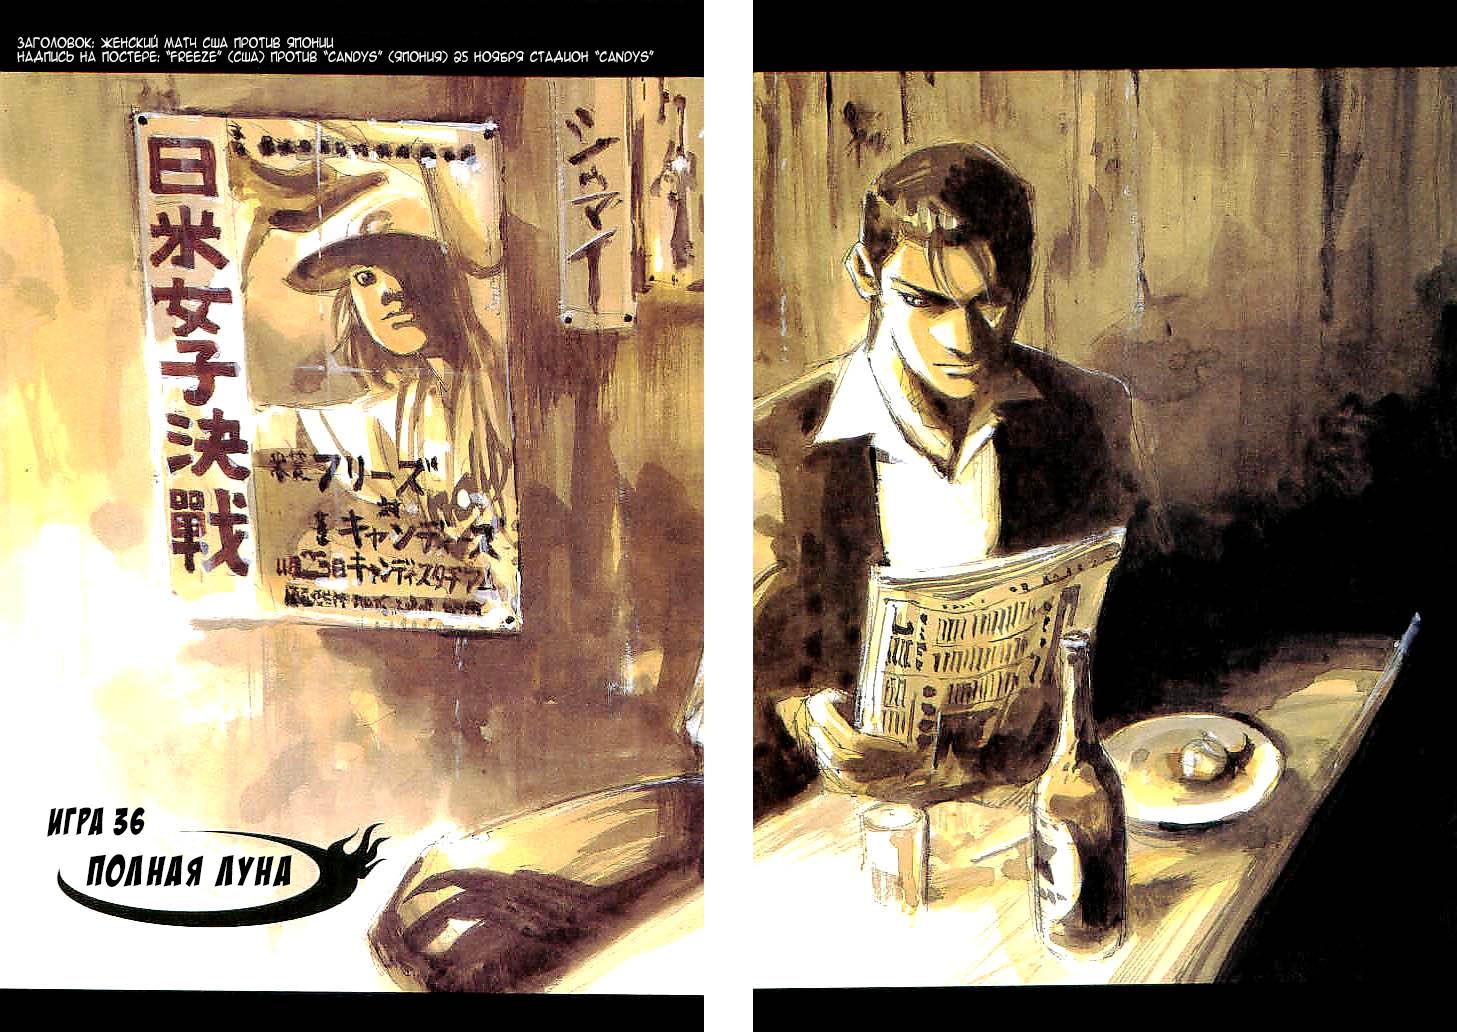 https://r1.ninemanga.com/comics/pic2/31/24287/323521/1493061229736.jpg Page 2